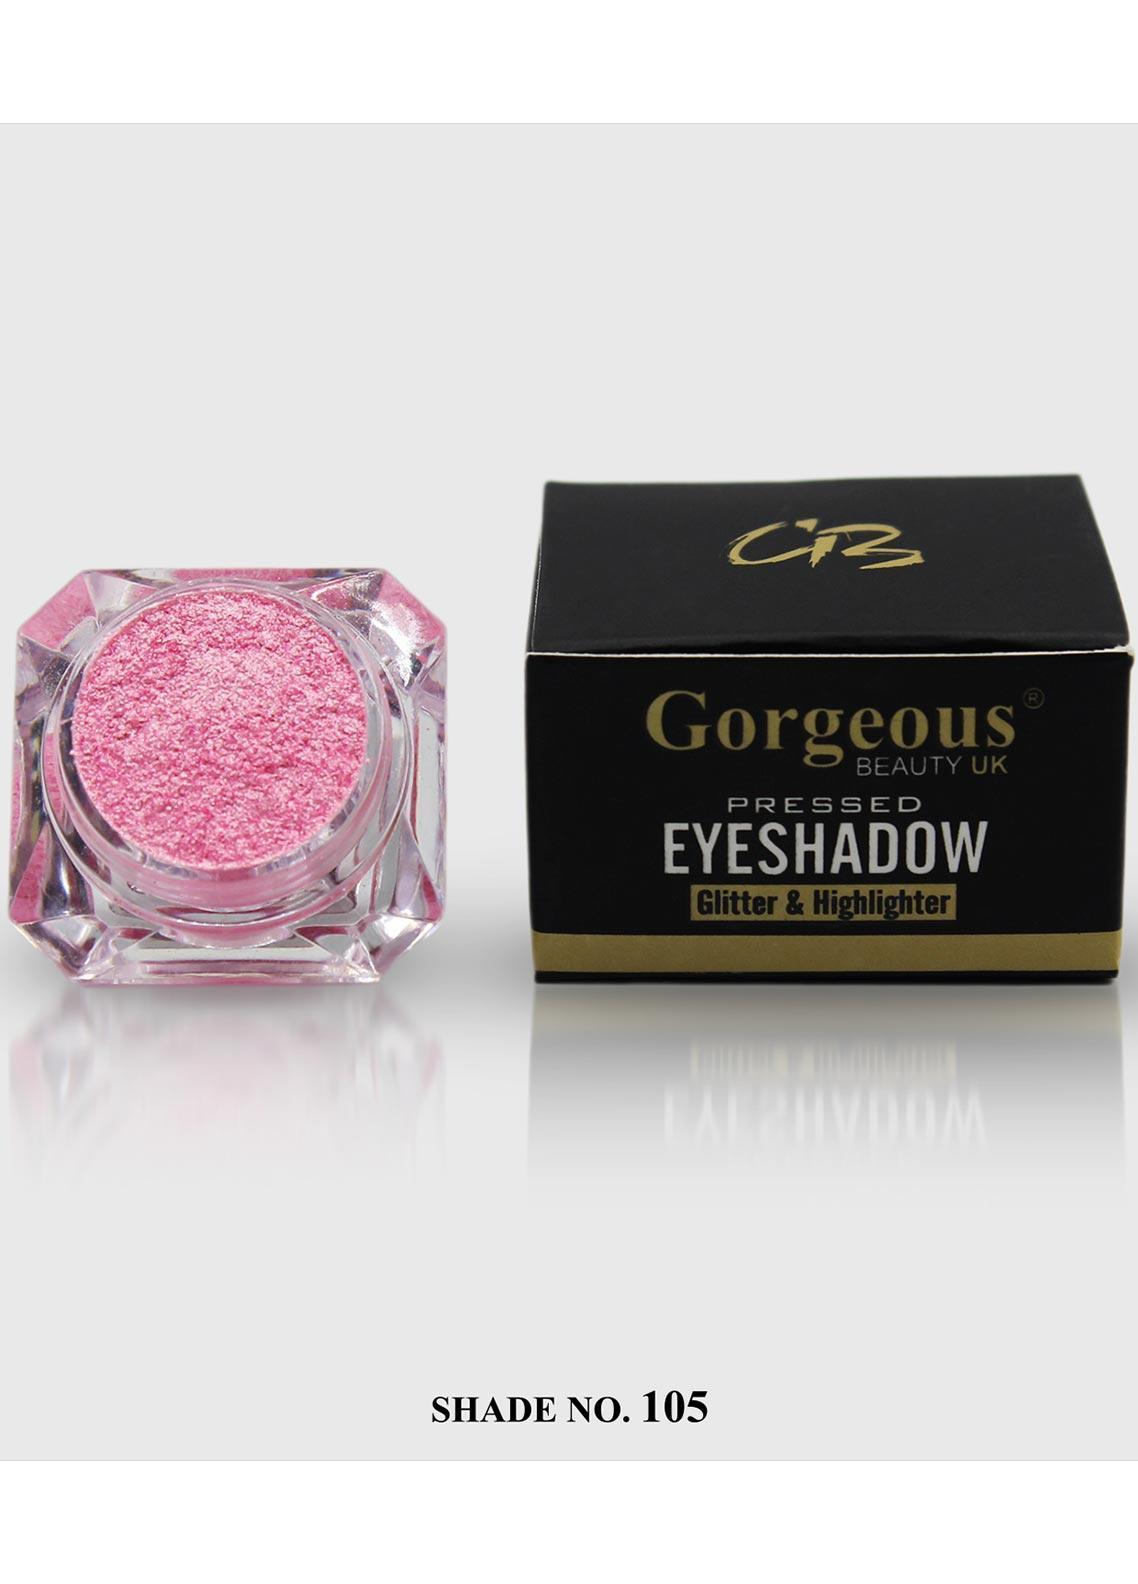 Pressed Eye Shadow Glitter & Highlighter-105